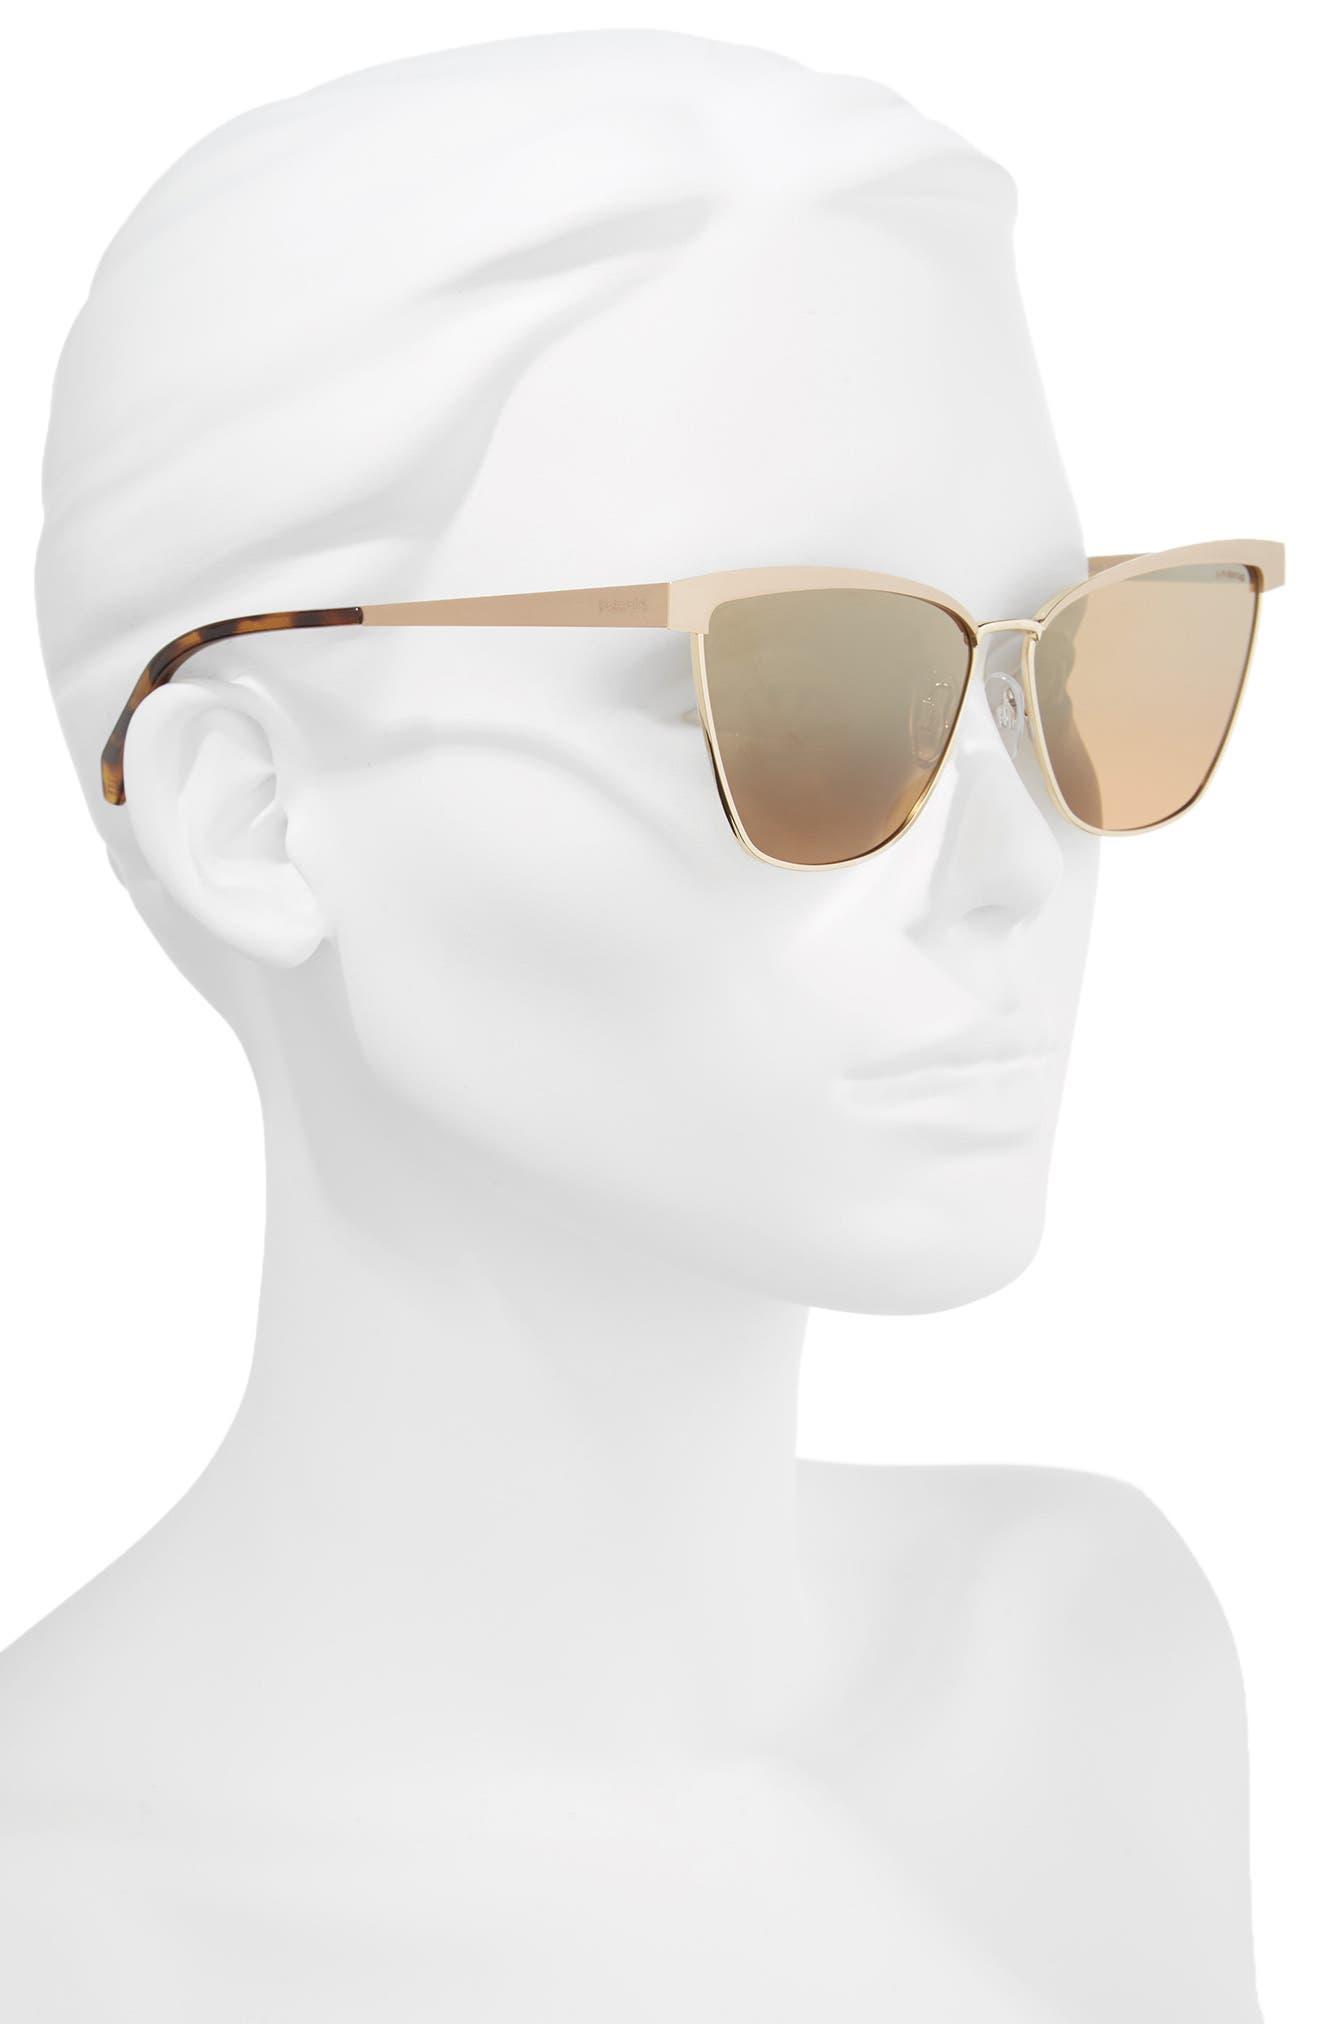 60mm Polarized Cat Eye Sunglasses,                             Alternate thumbnail 2, color,                             Gold